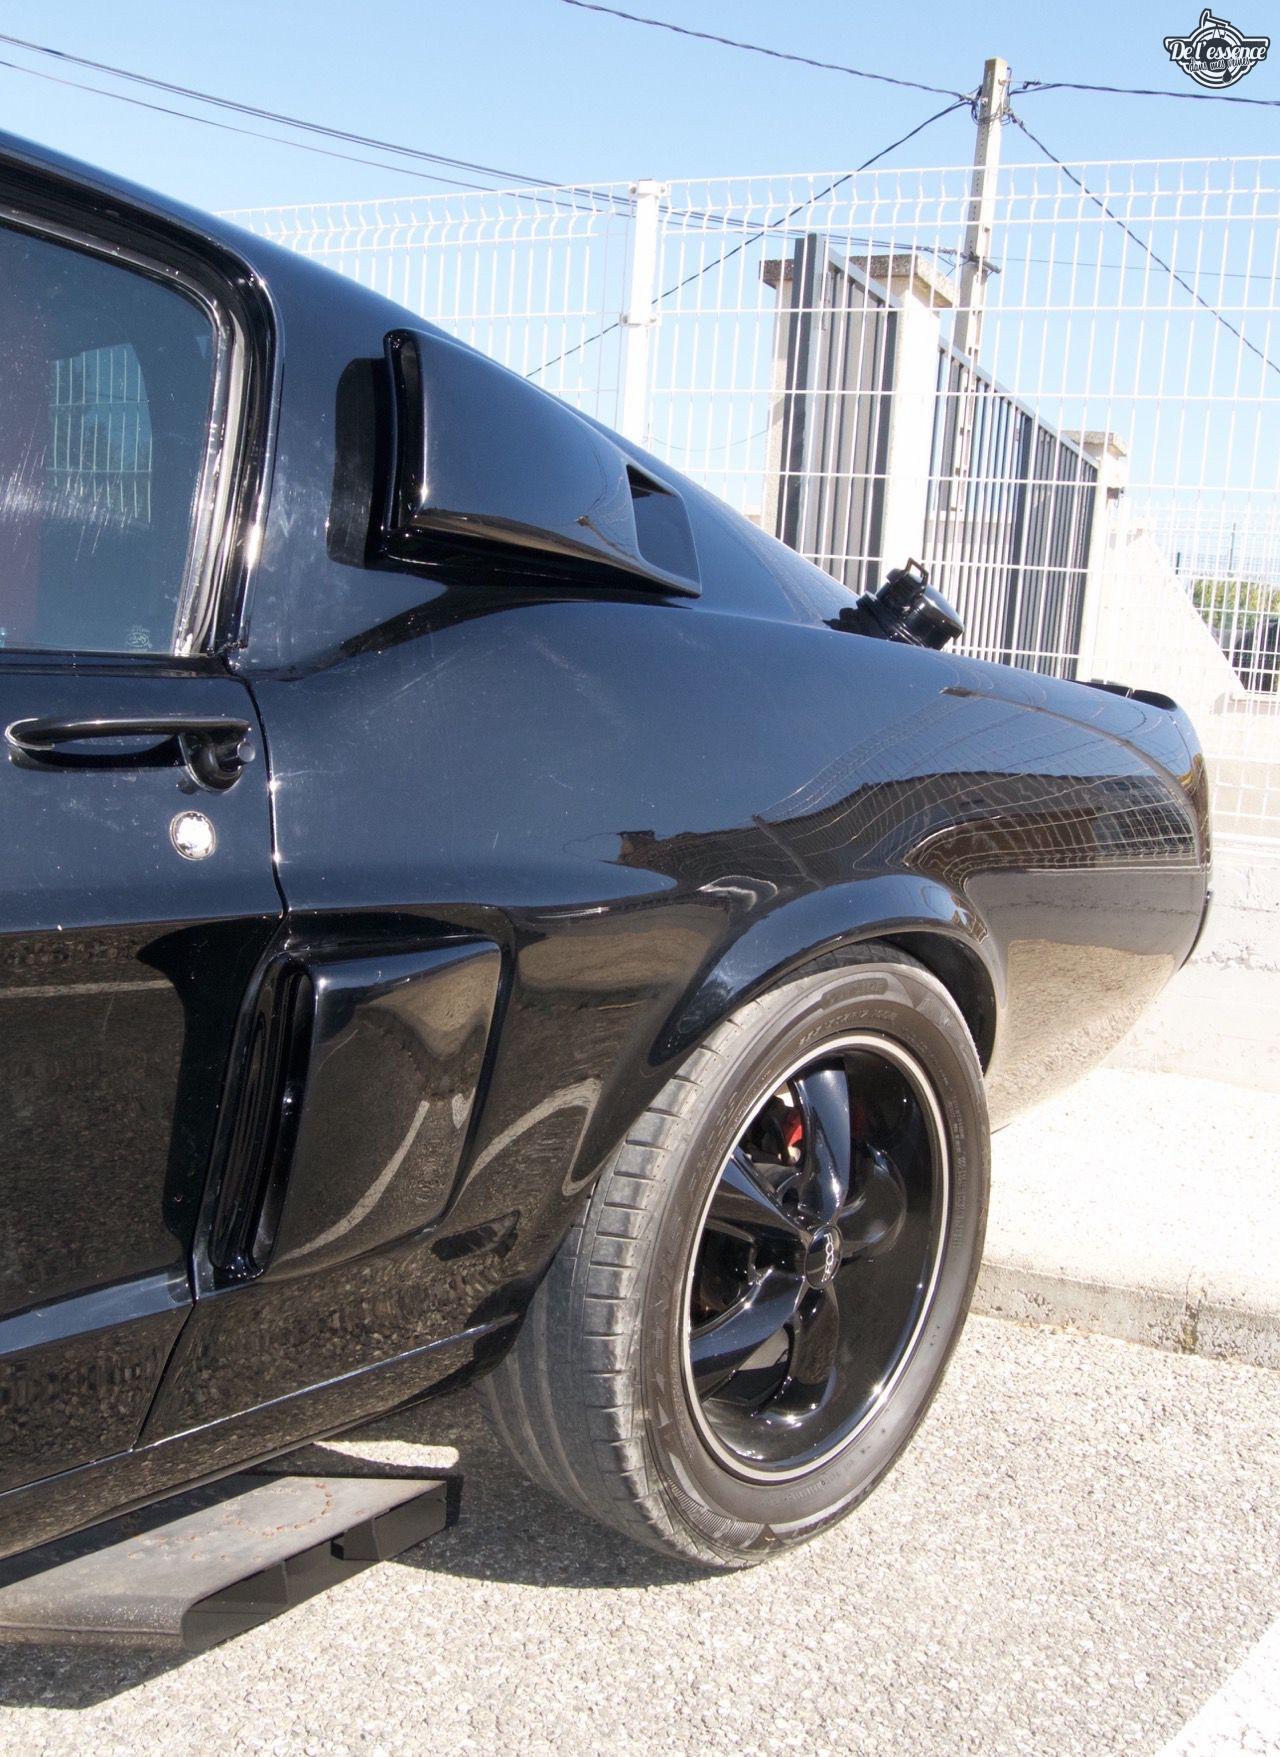 '67 Ford Mustang Shelby GT500 Replica... Bienvenue en enfer ! 87